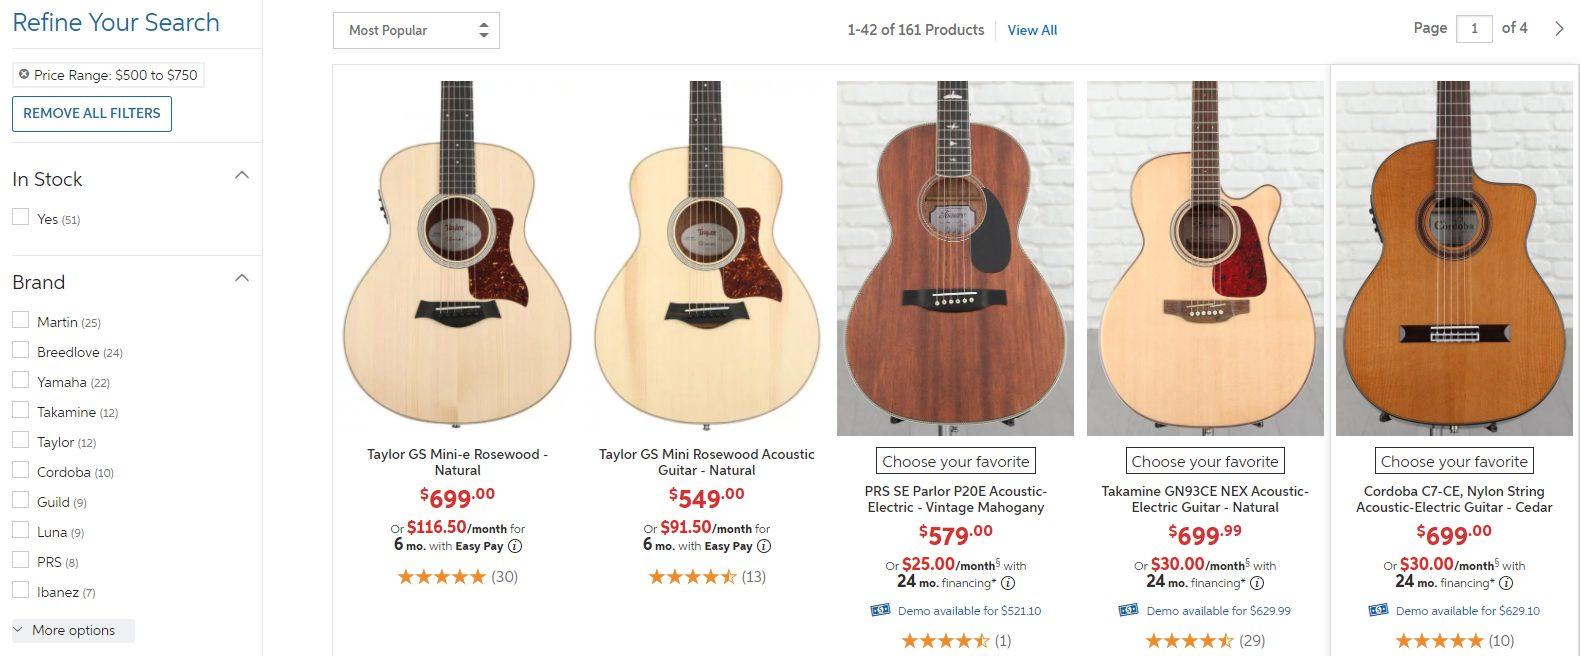 Top Guitar Options in 500 to 700 Dollar Price Range